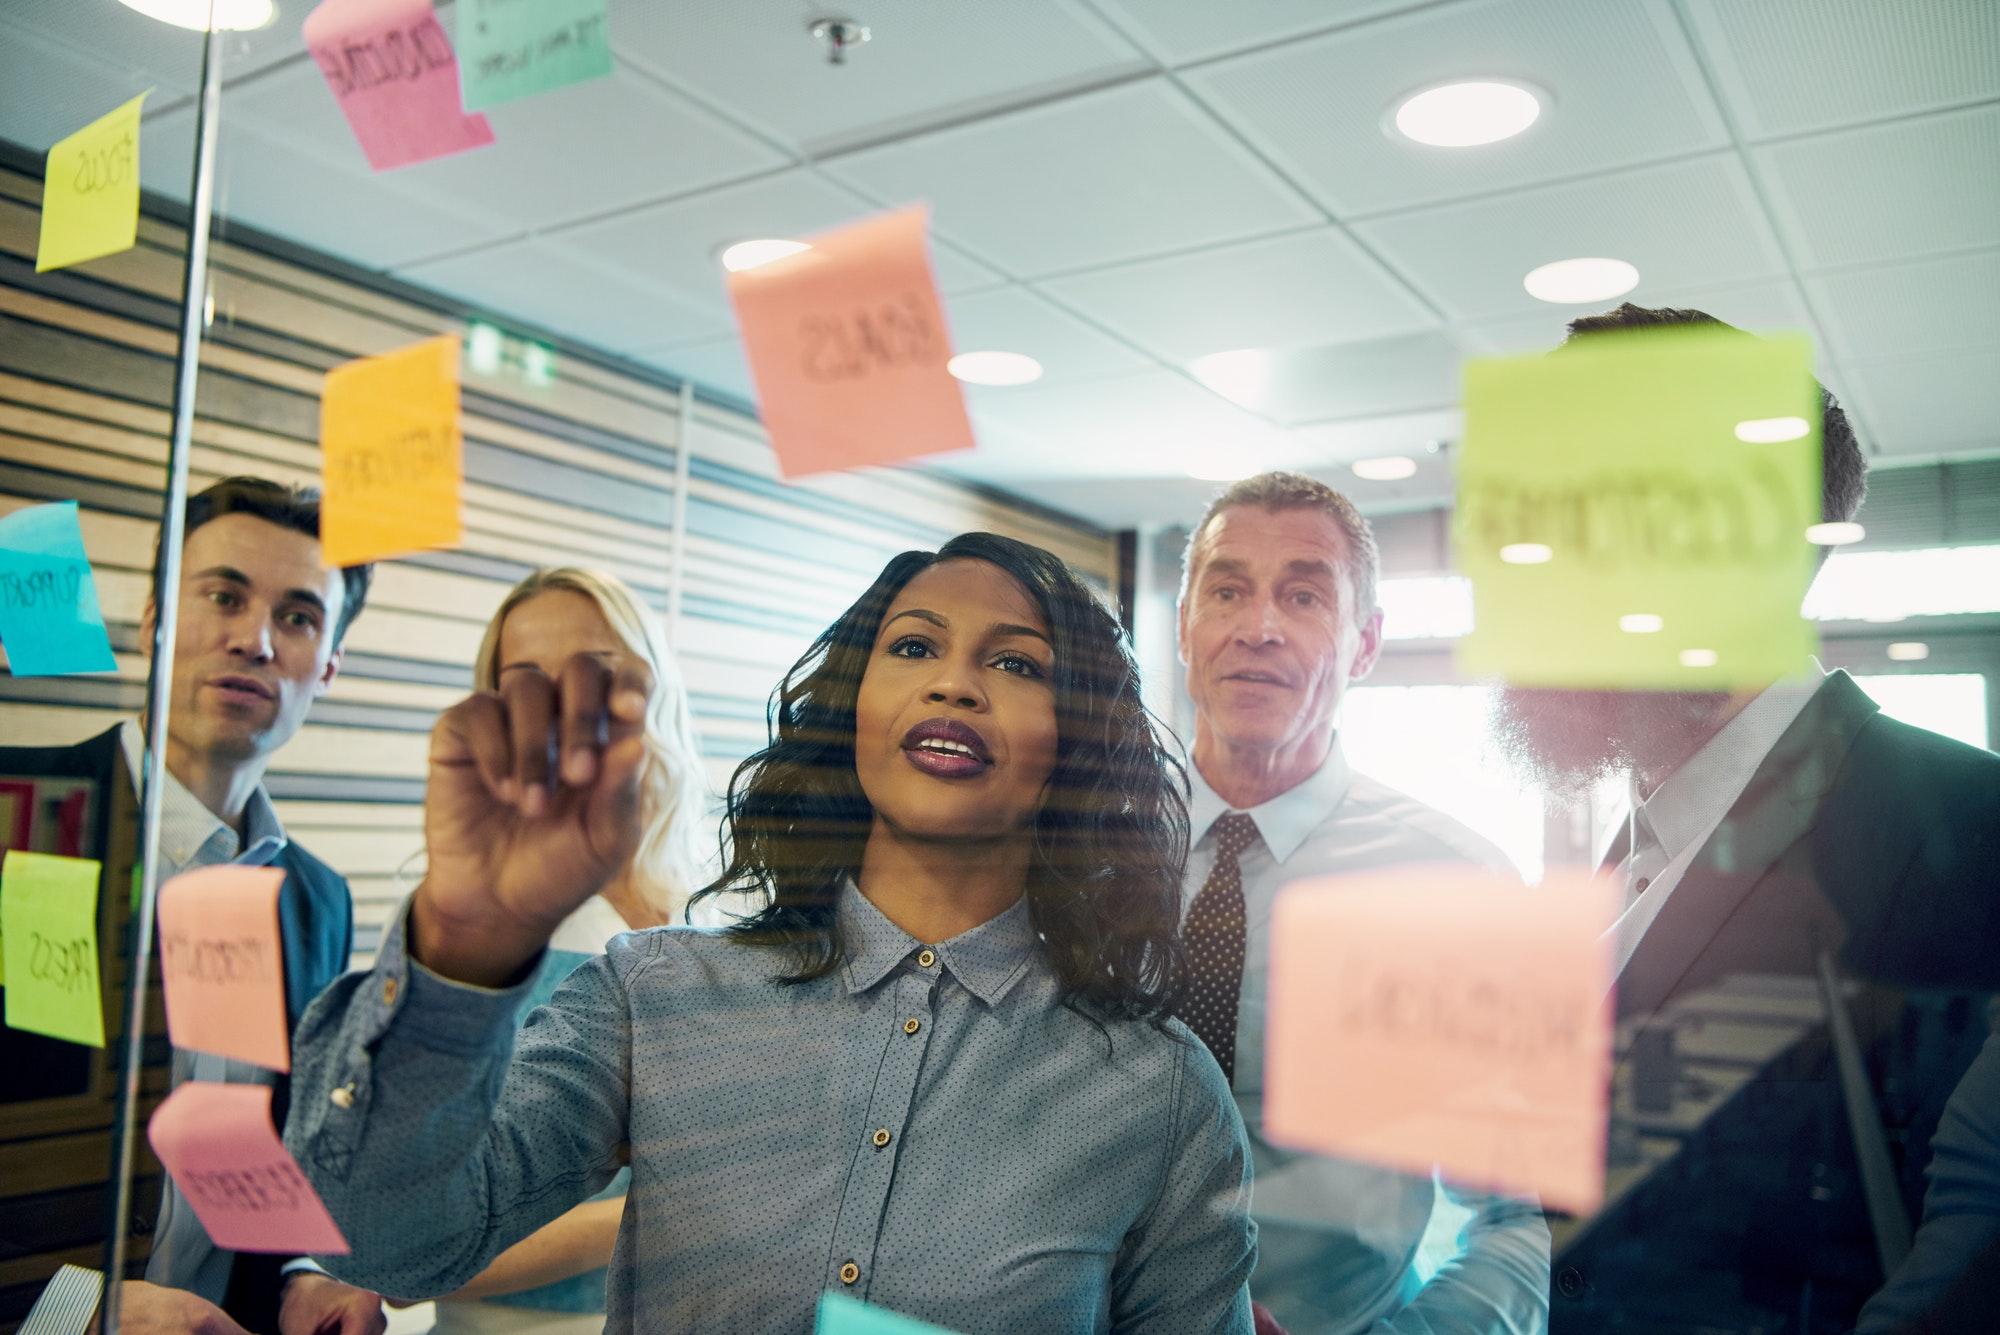 Group of businesspeople brainstorming